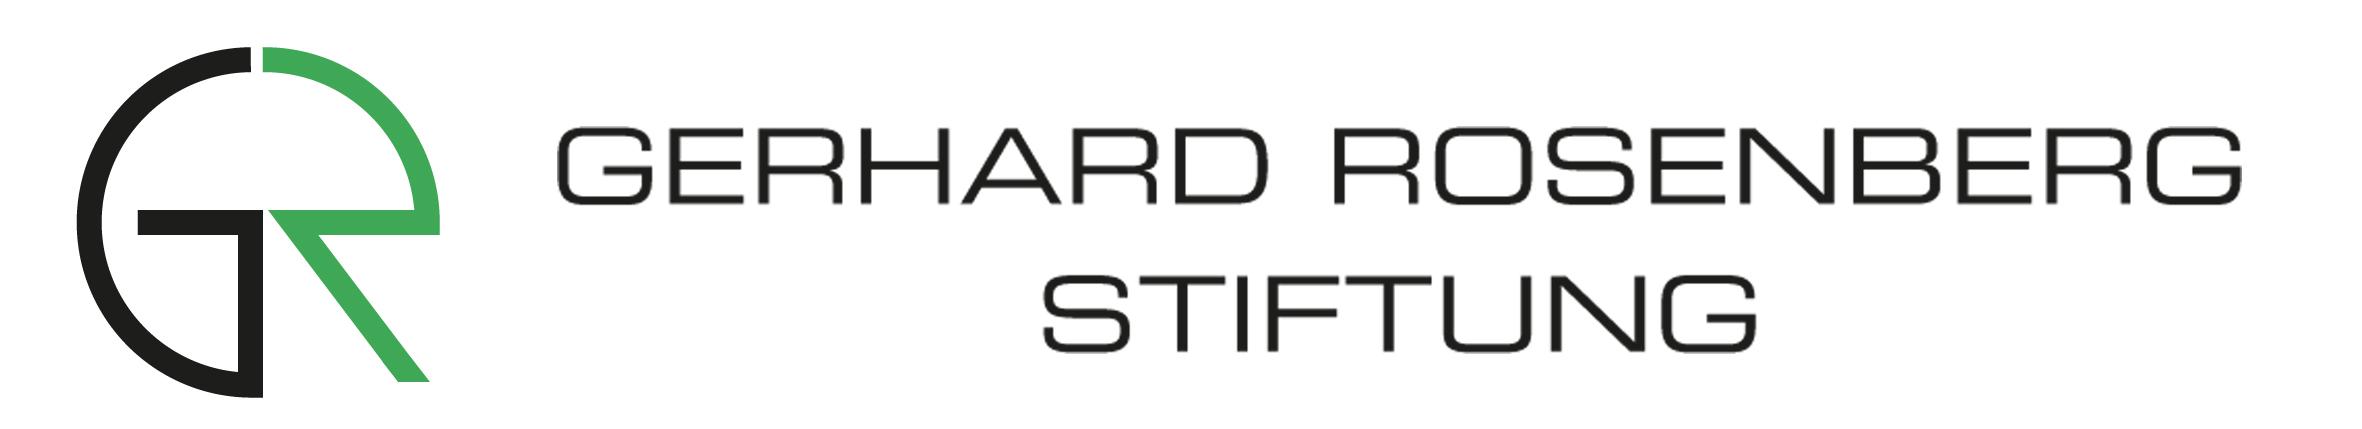 Gerhard Rosenberg Stiftung